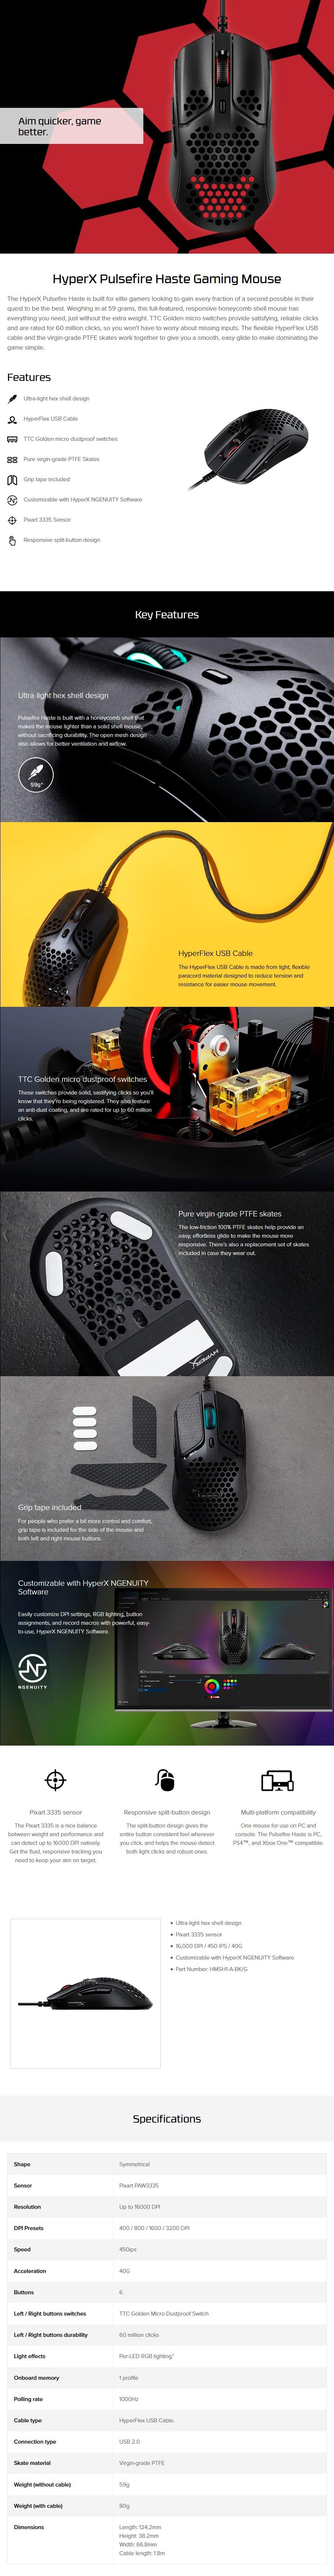 hyperx-pulsefire-haste-ultralight-gaming-mouse-ac41834-7.jpg